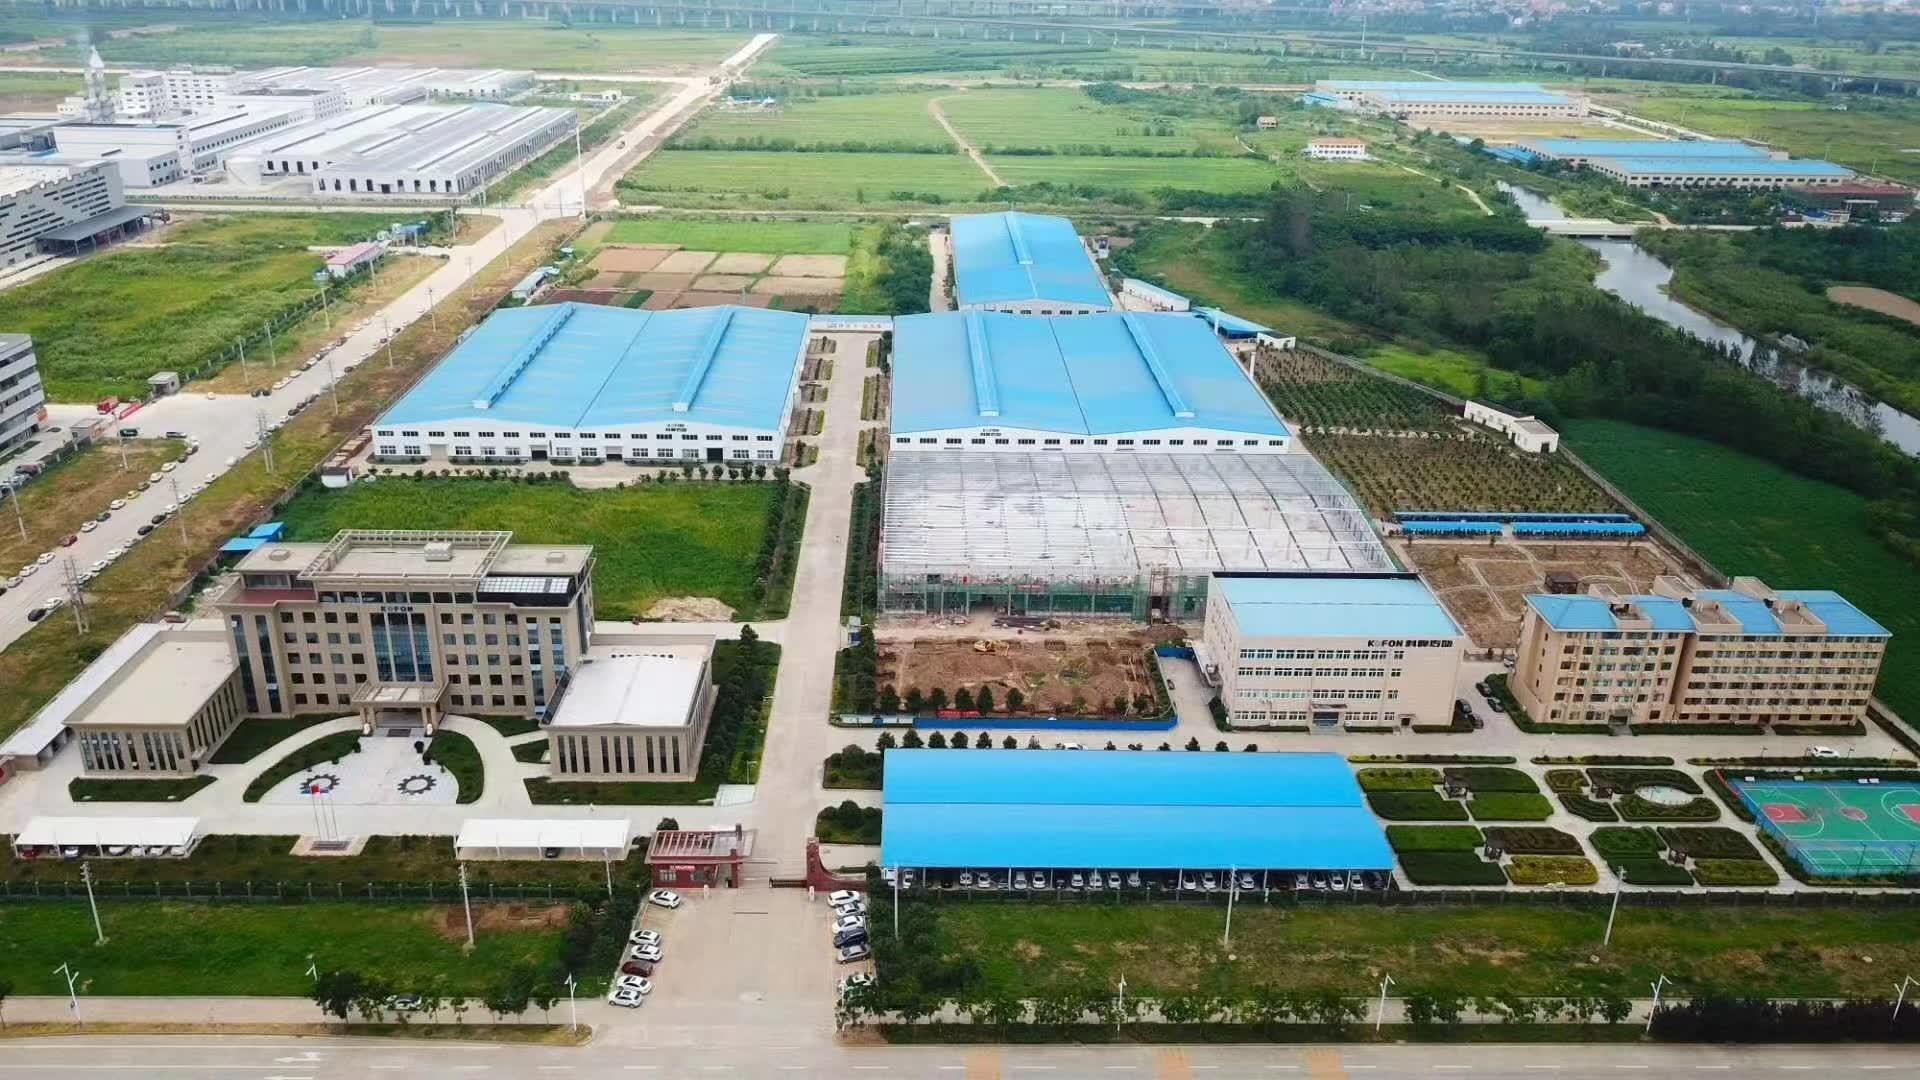 Hubei Kofon Transmission Equipment Co., Ltd